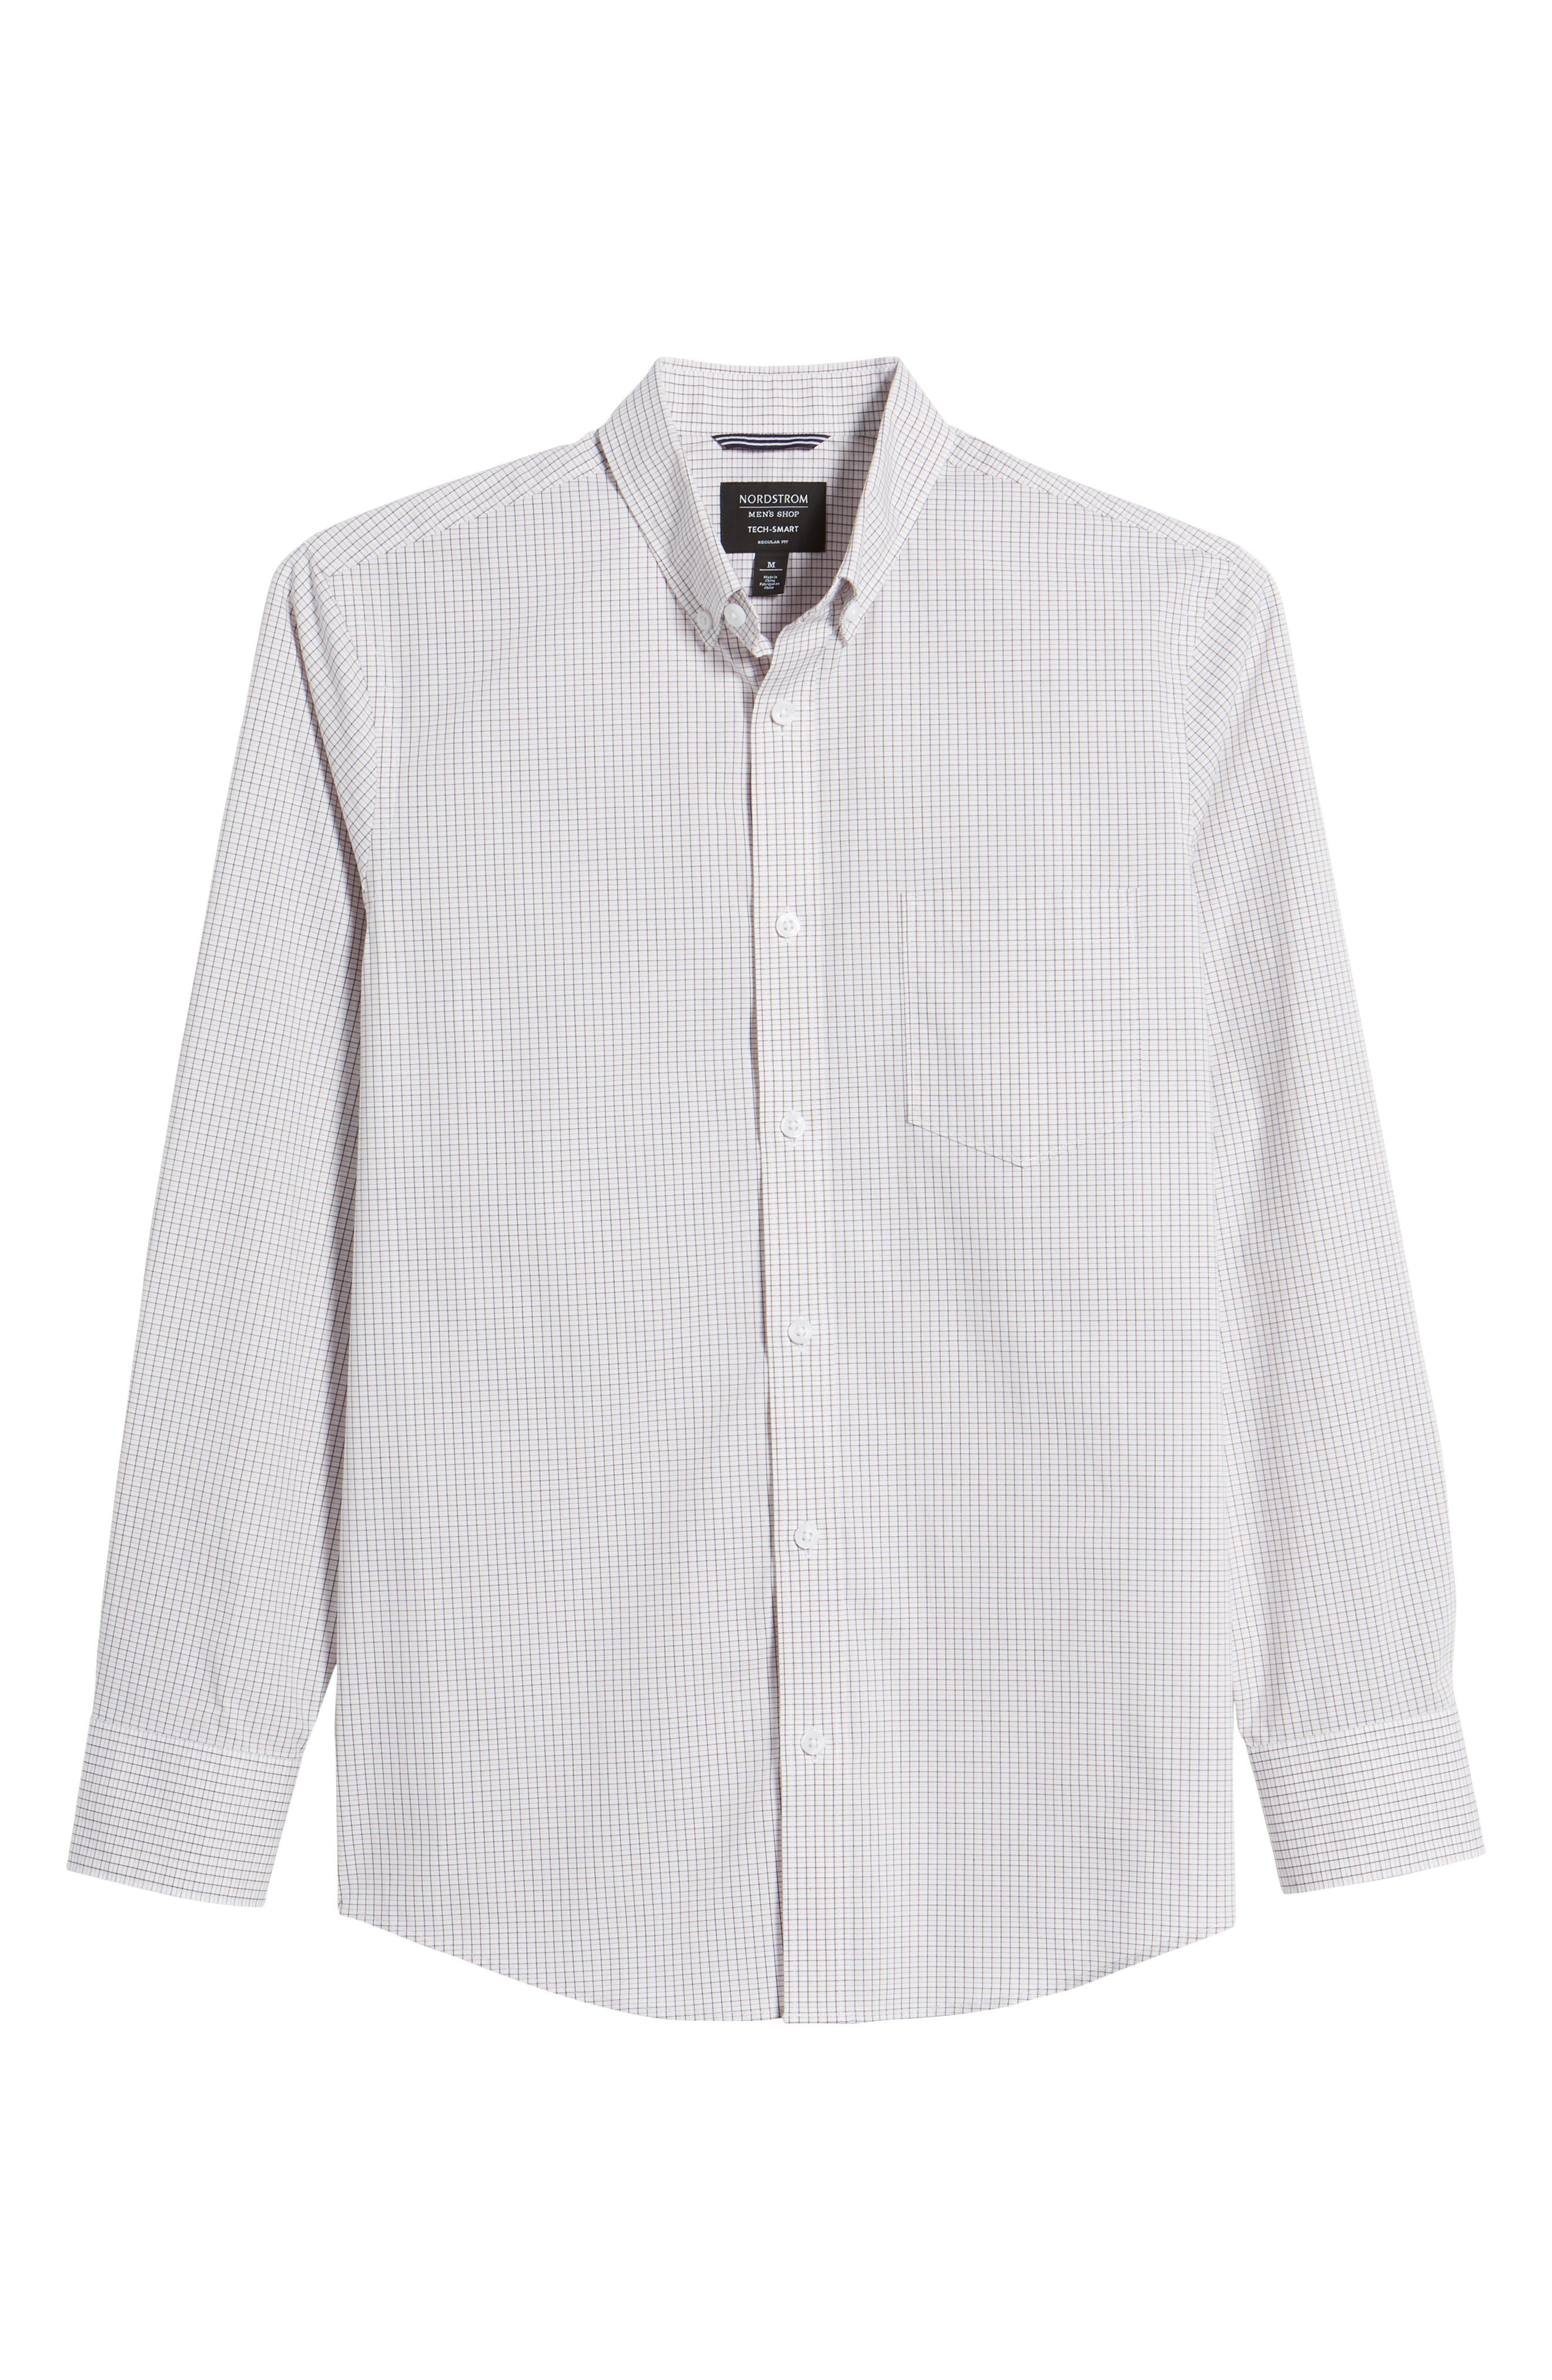 Tech-Smart Regular Fit Check Sport Shirt,                             Alternate thumbnail 6, color,                             660